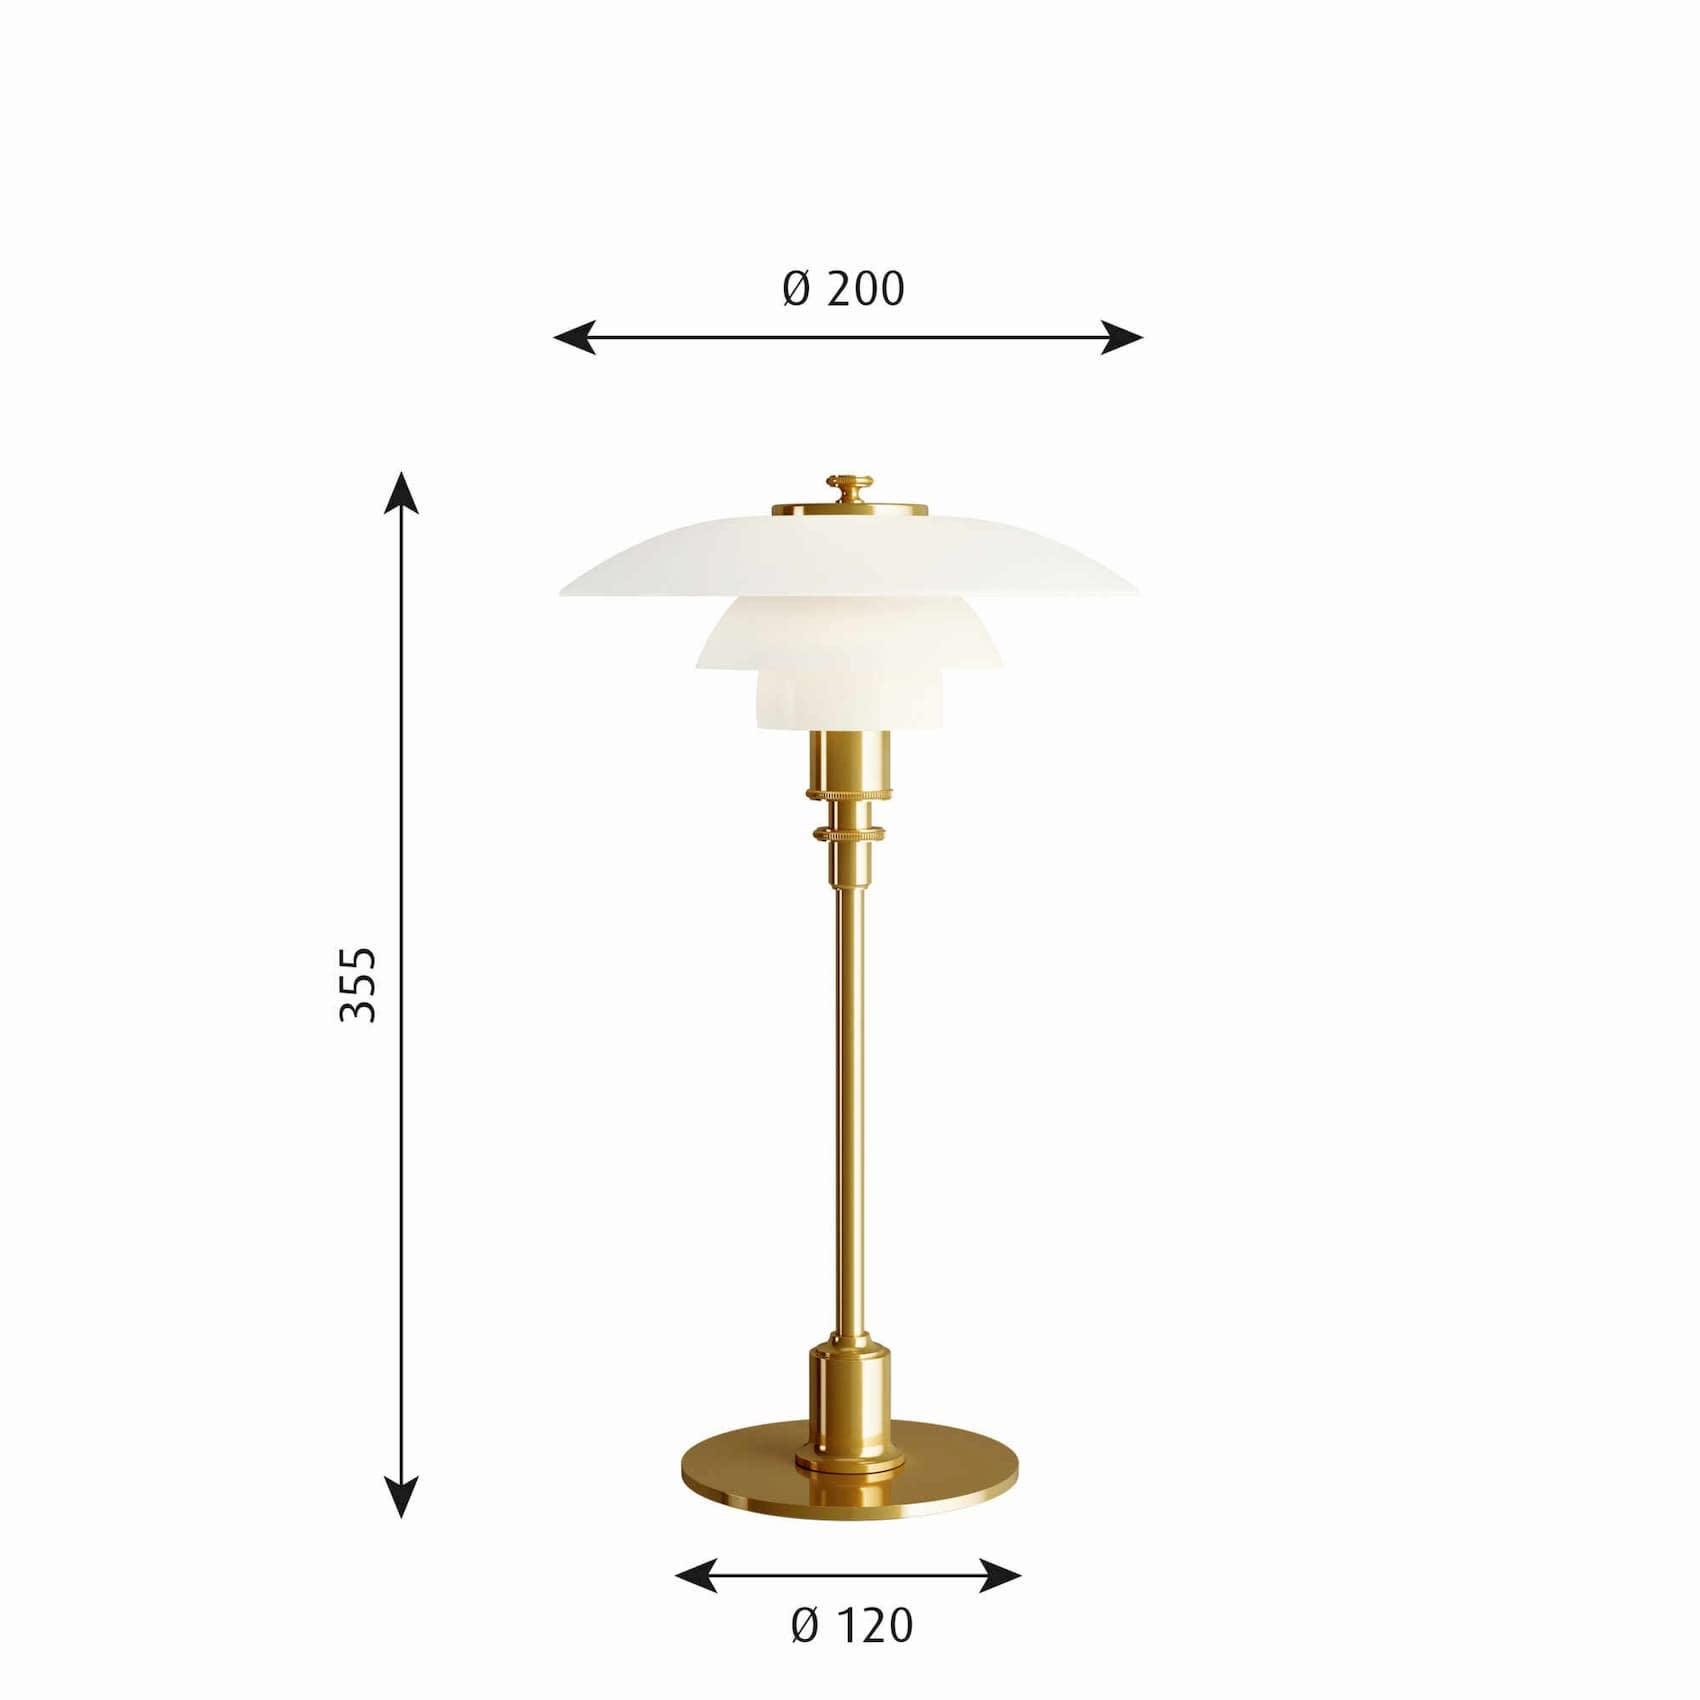 louis-poulsen-ph-2-1-lamp-dimensions